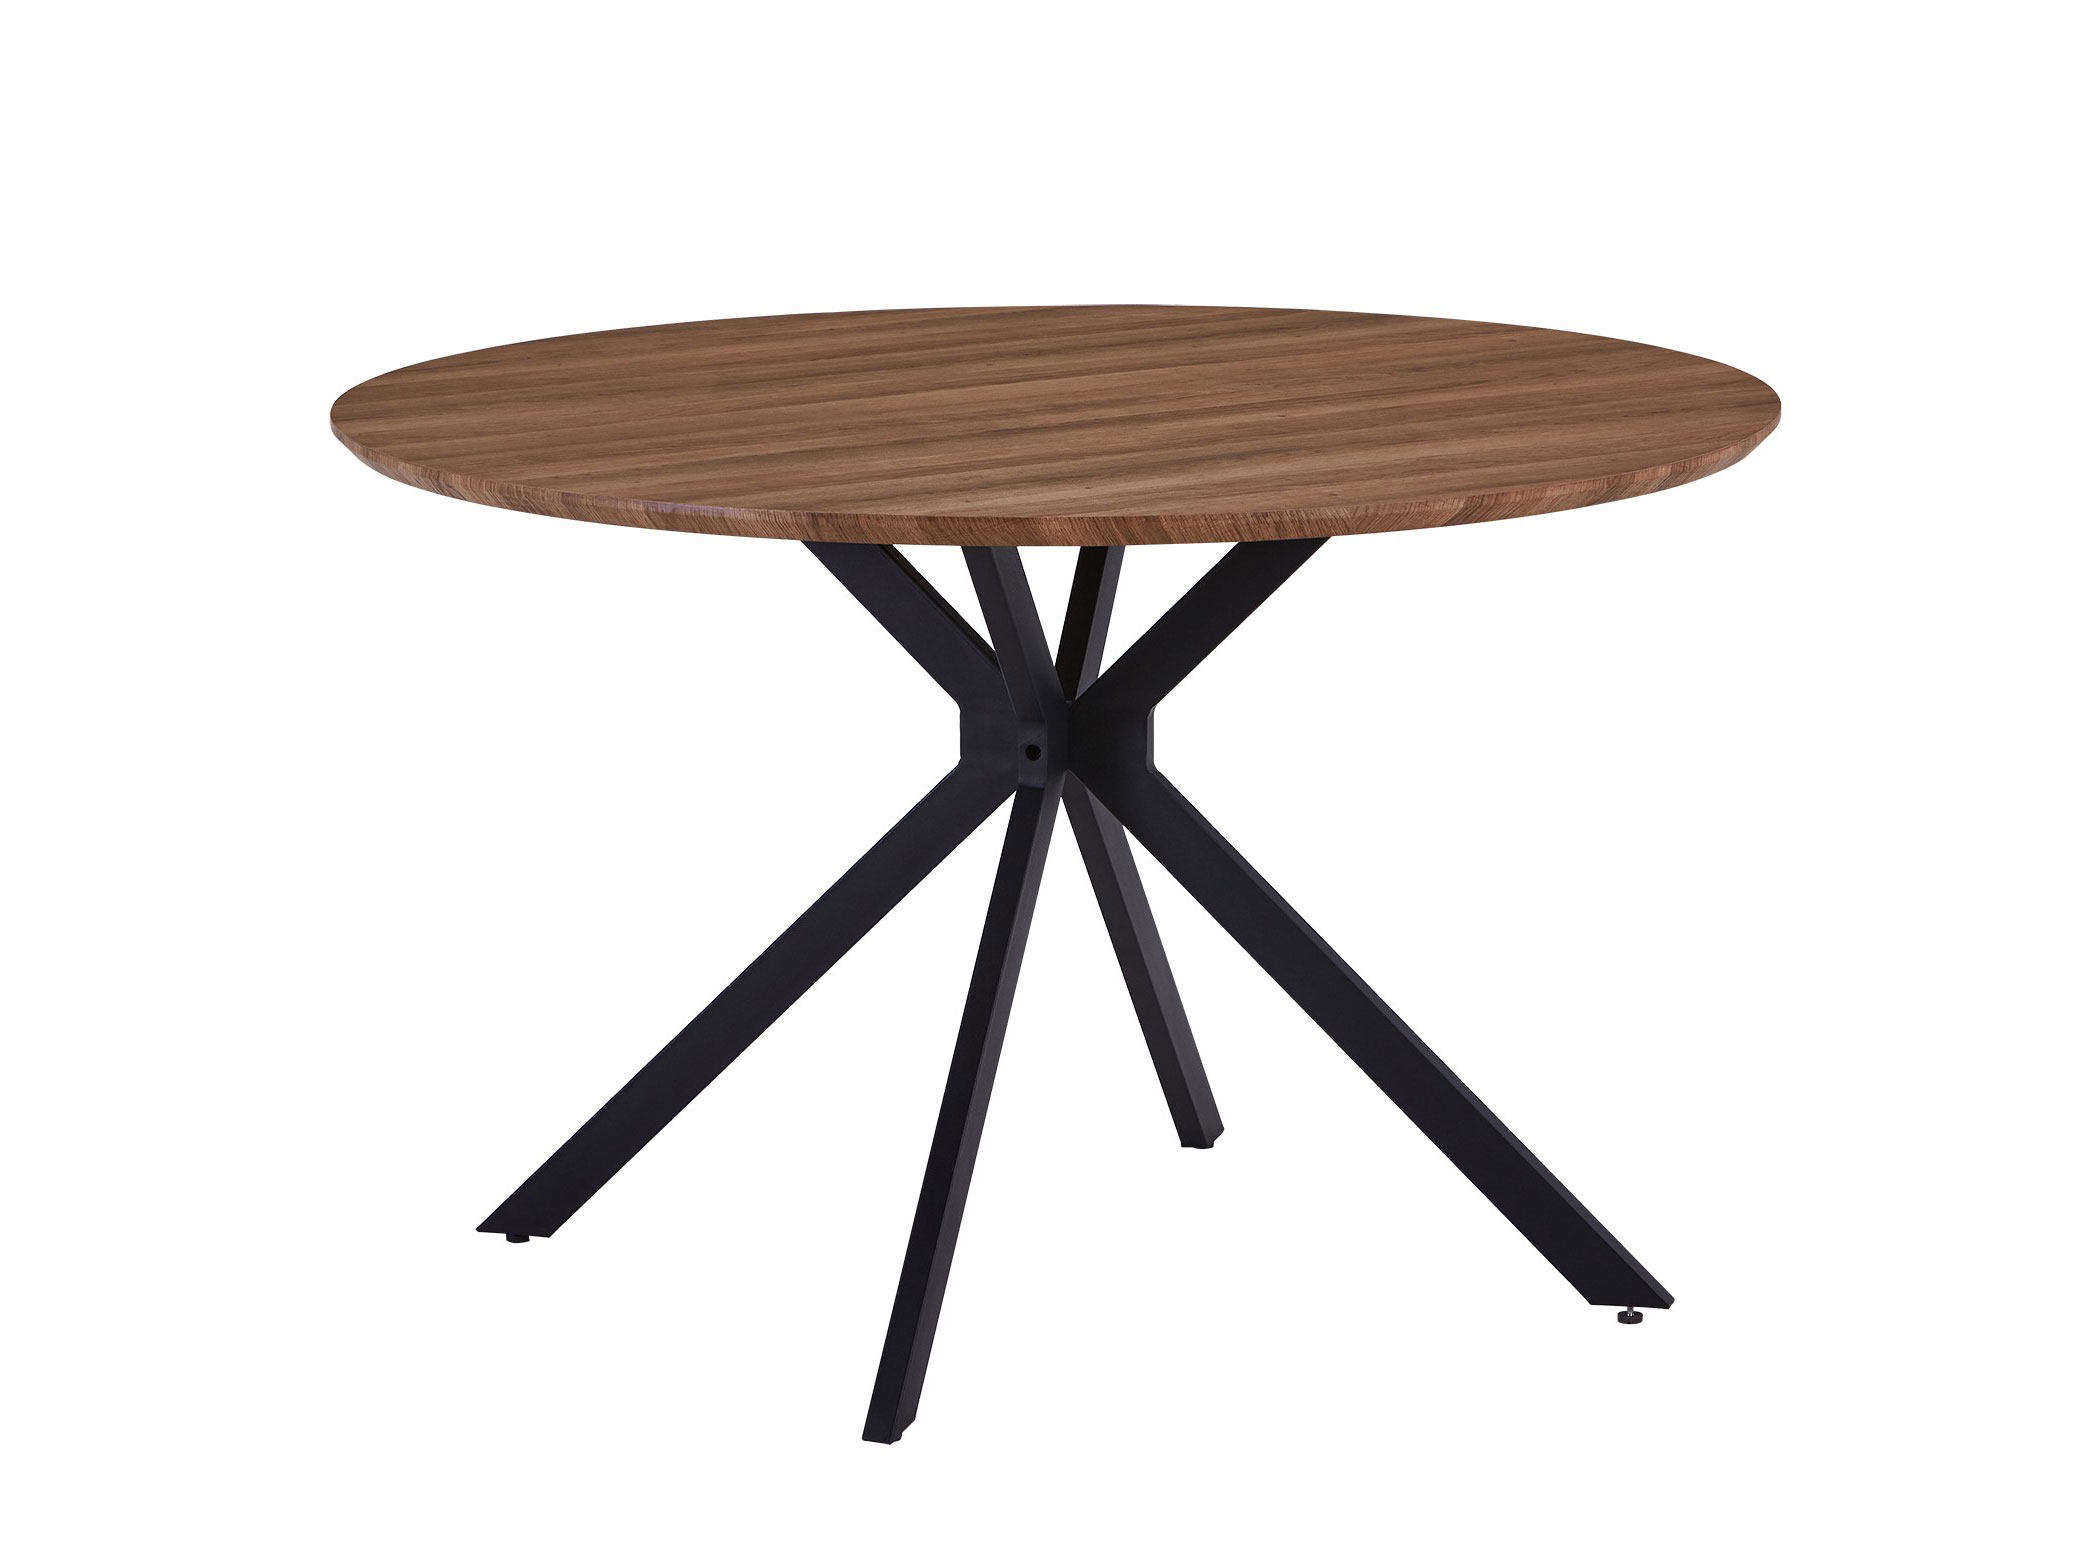 Ronde Tafel Hout : Ronde tafel mdt oak hout deba meubelen